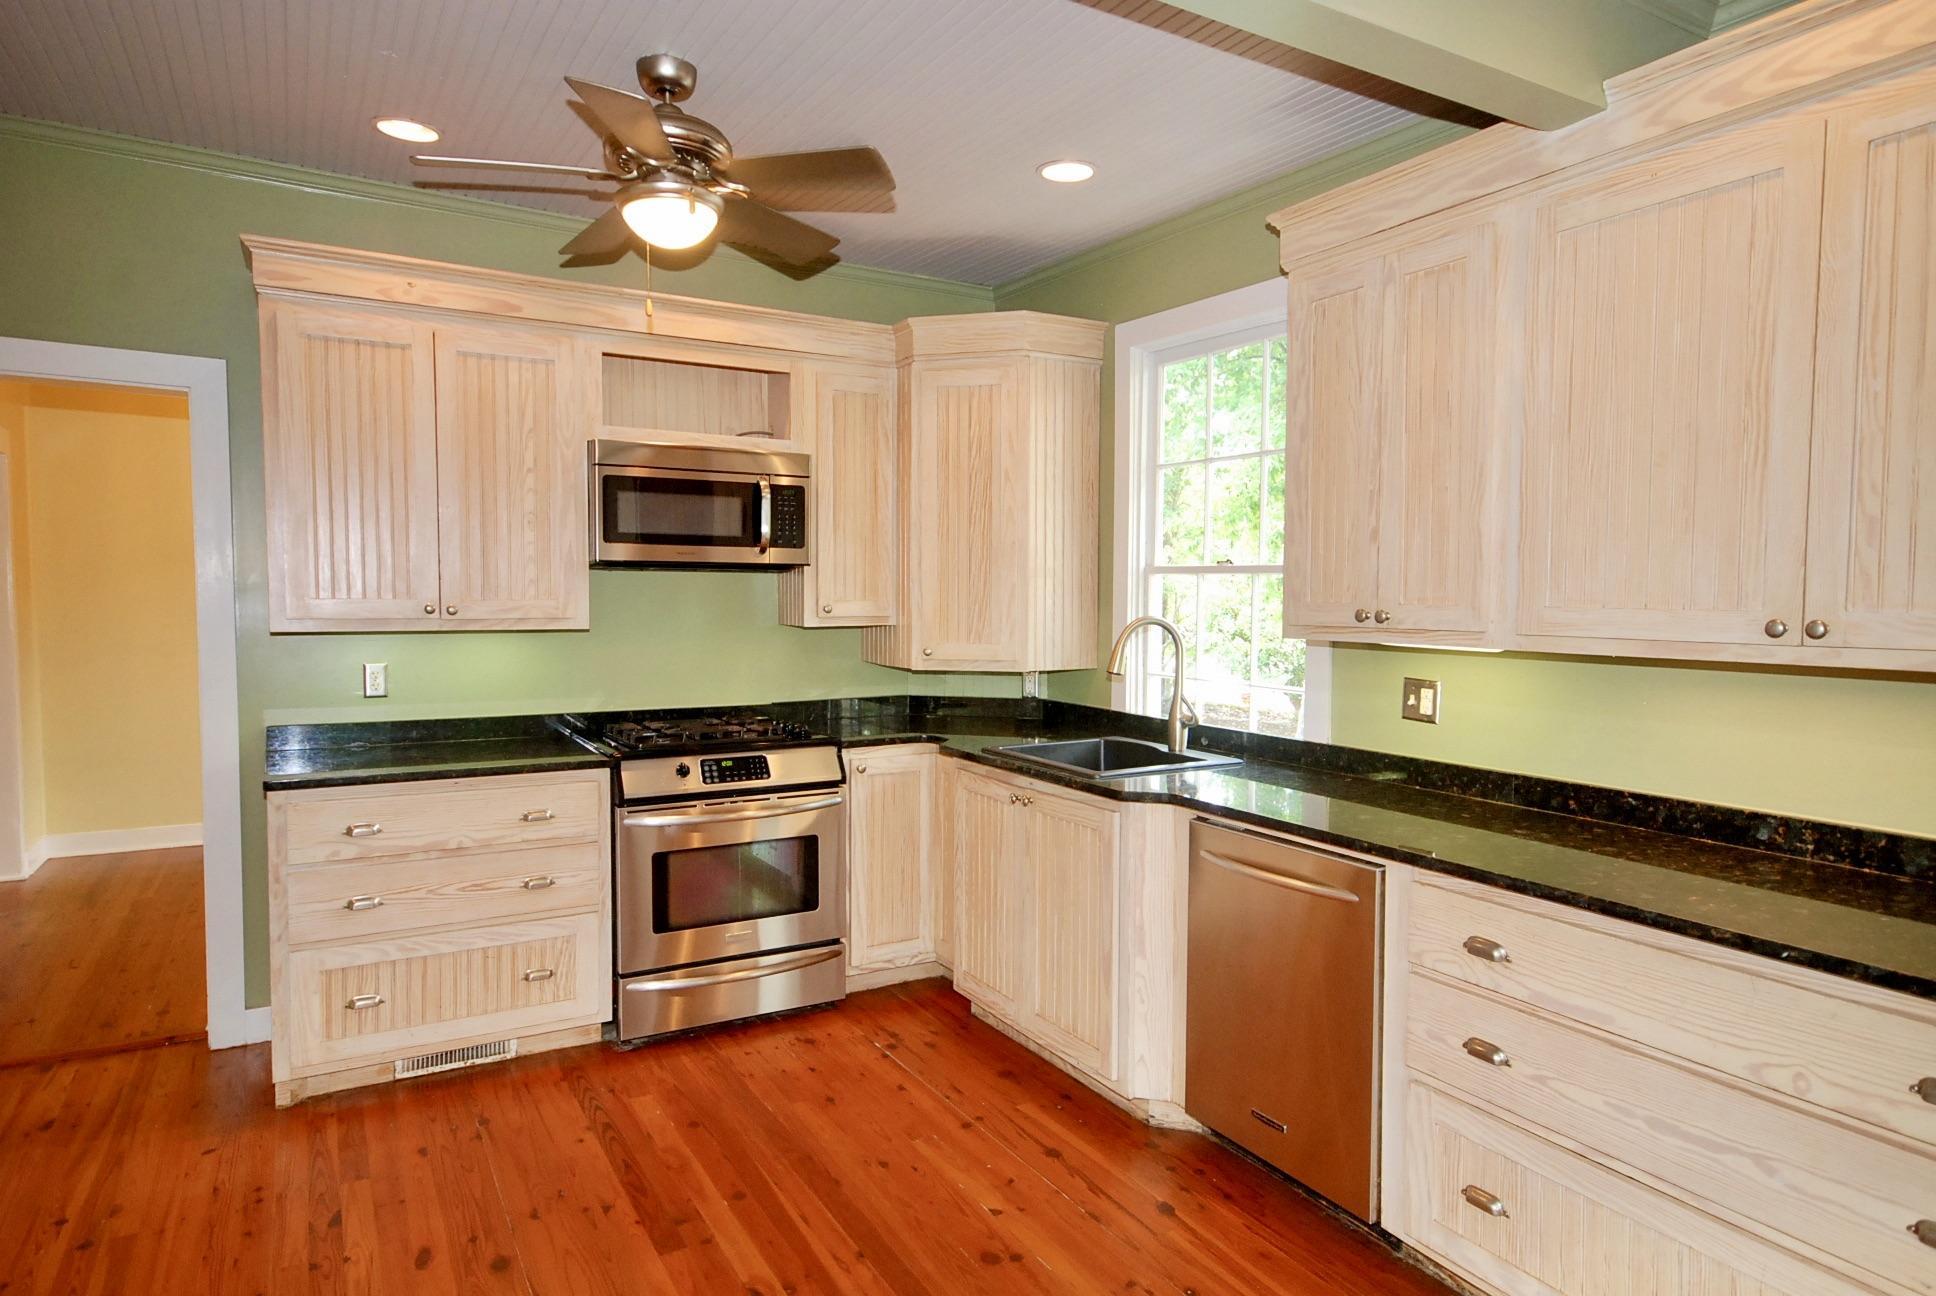 Carolina Terrace Homes For Sale - 28 Lolandra, Charleston, SC - 1